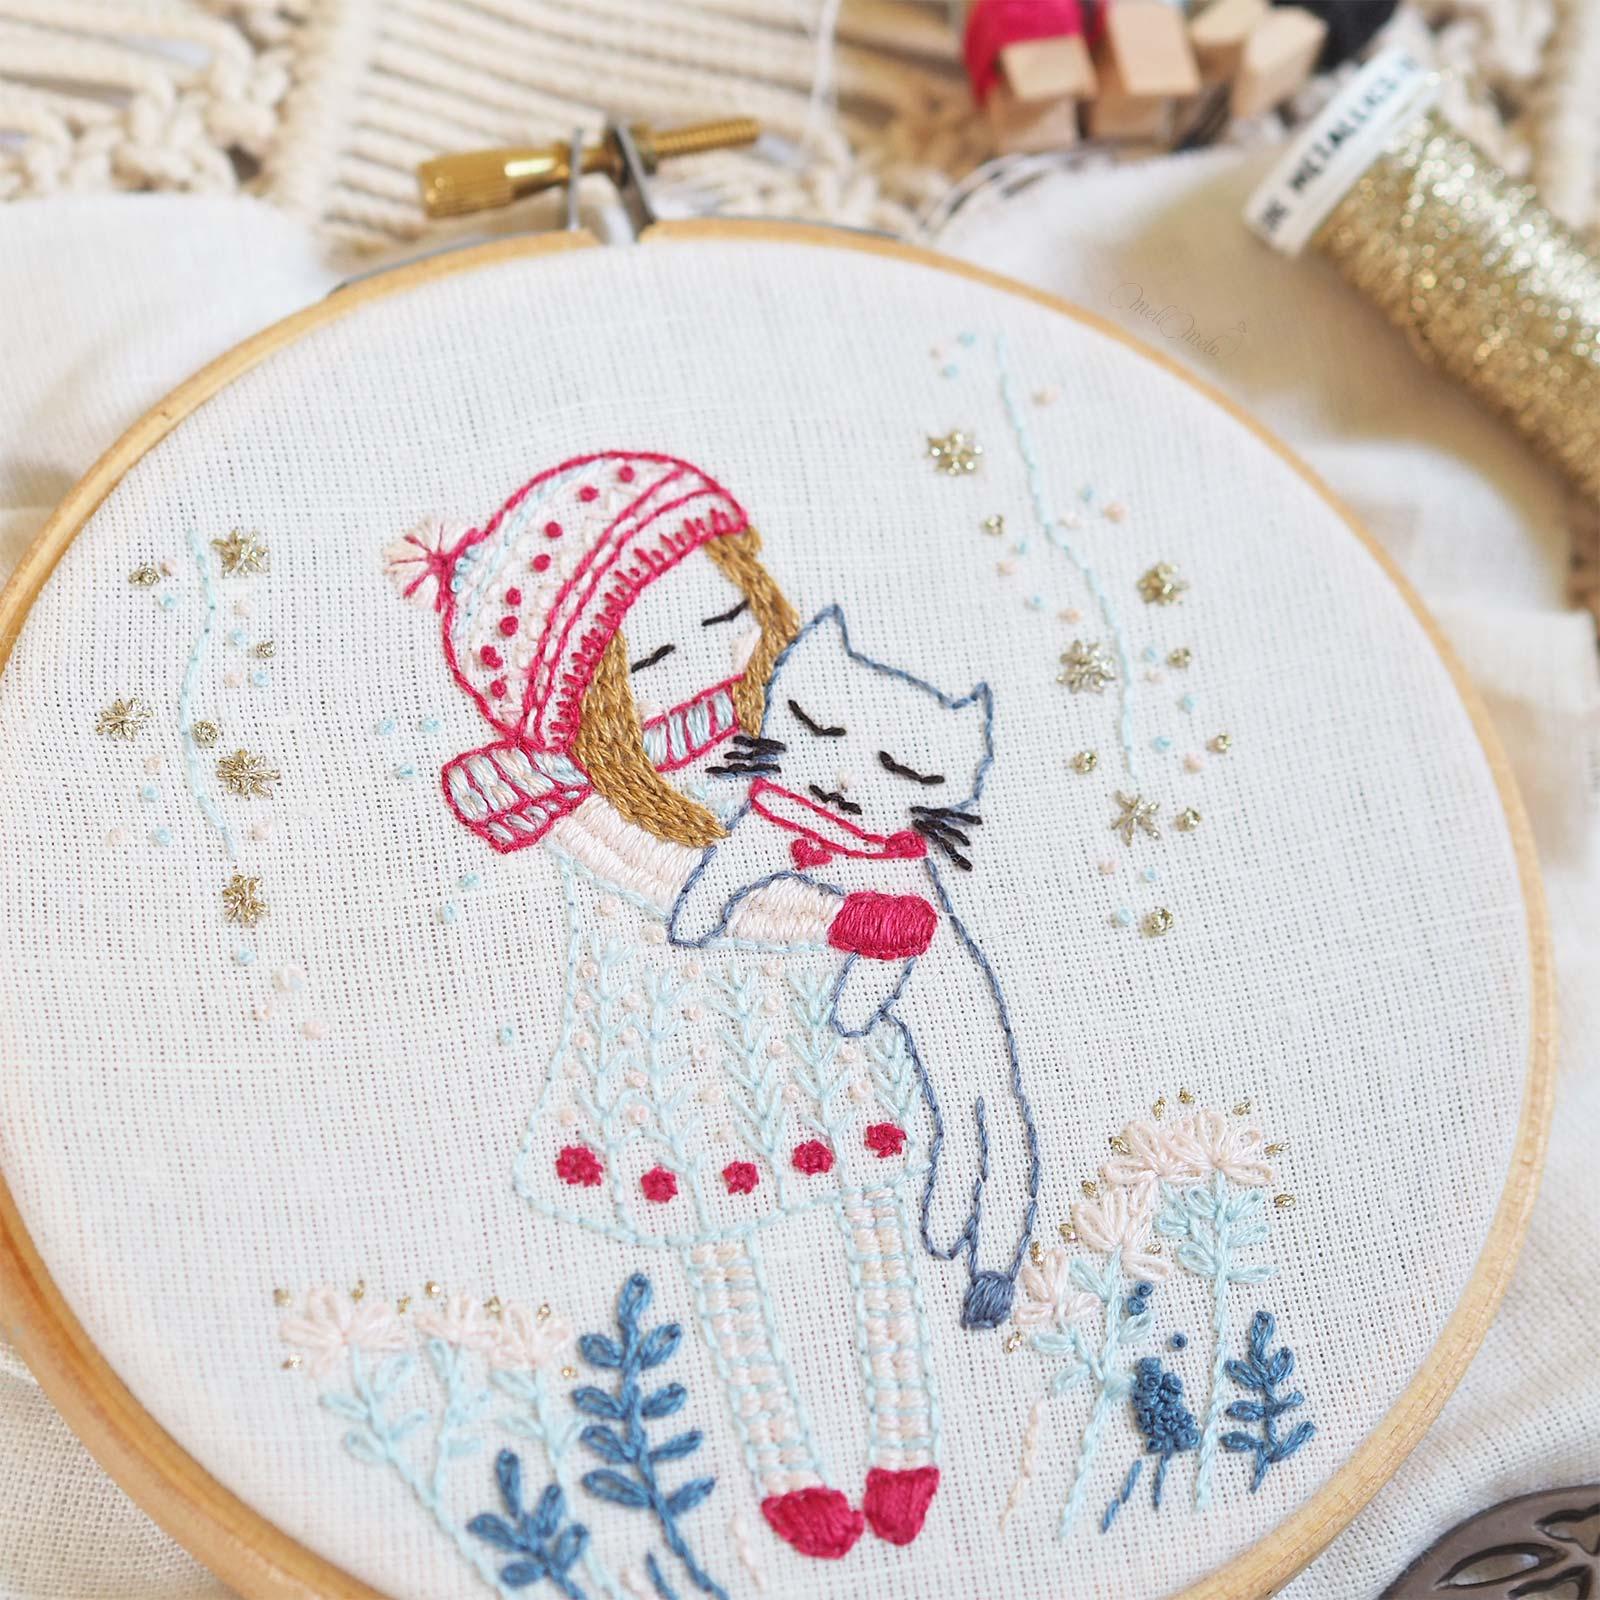 broderie-demoiselle-hiver-lilipopo-laboutiquedemelimelo